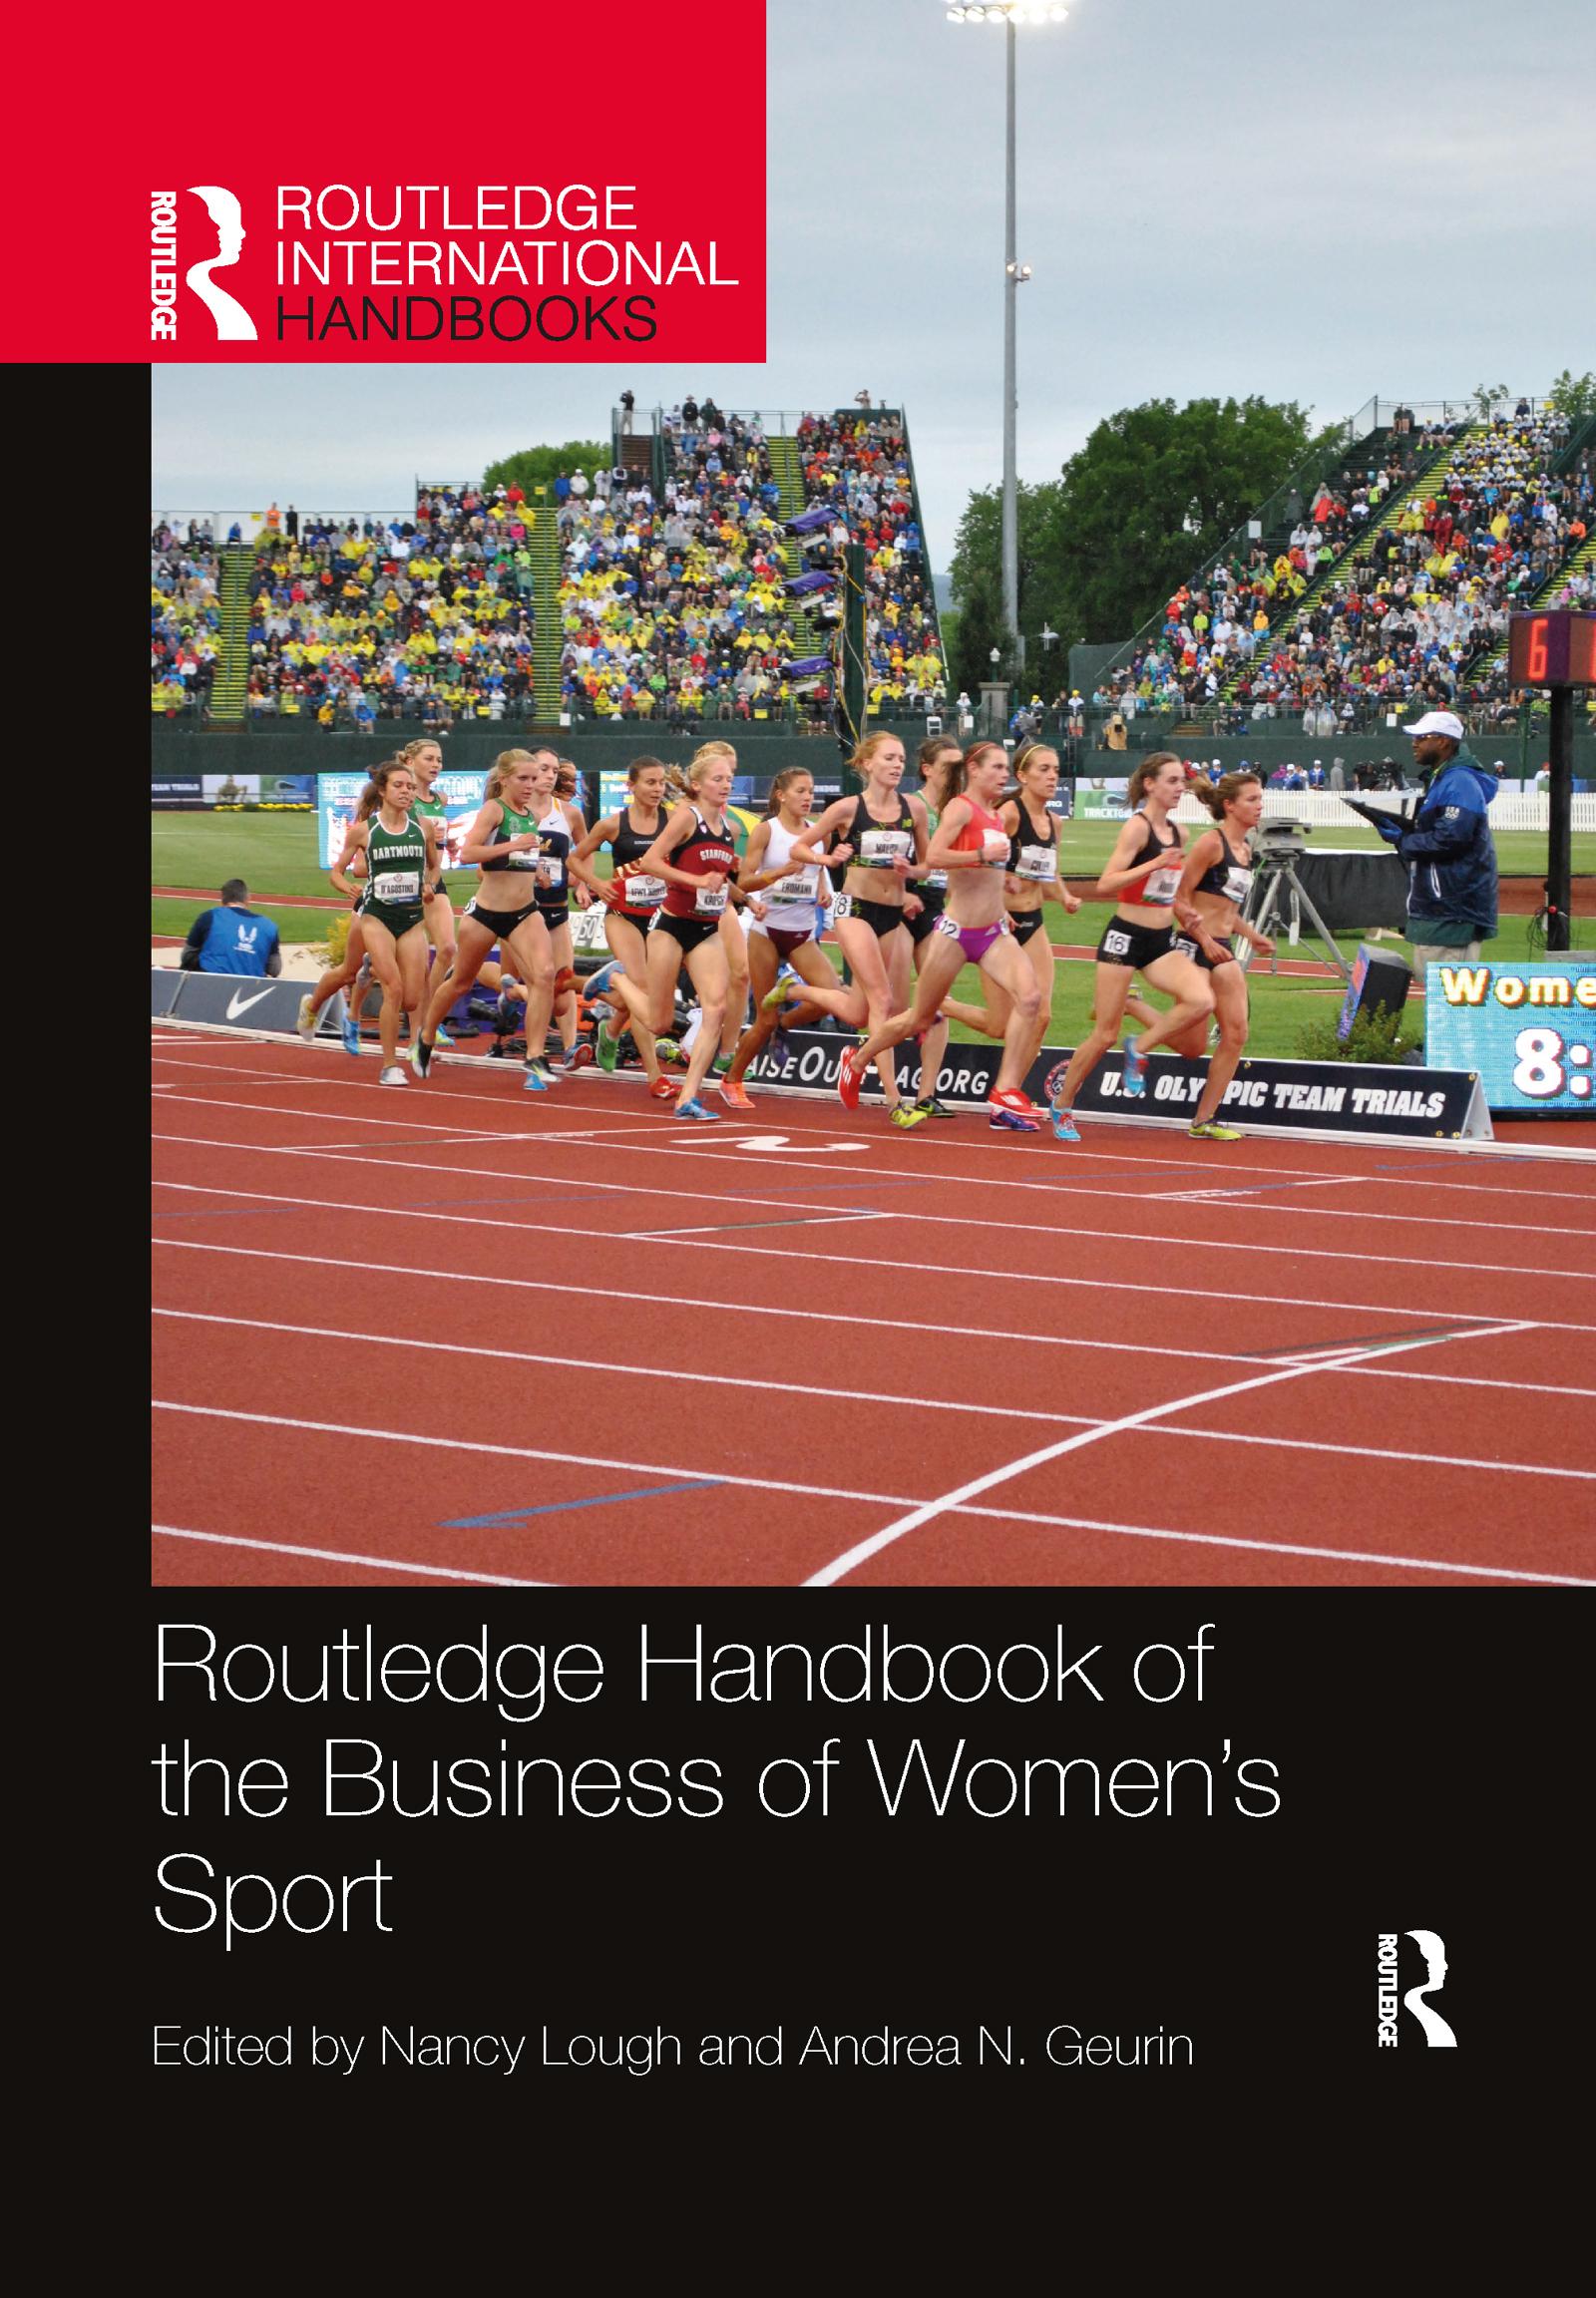 Routledge Handbook of the Business of Women's Sport